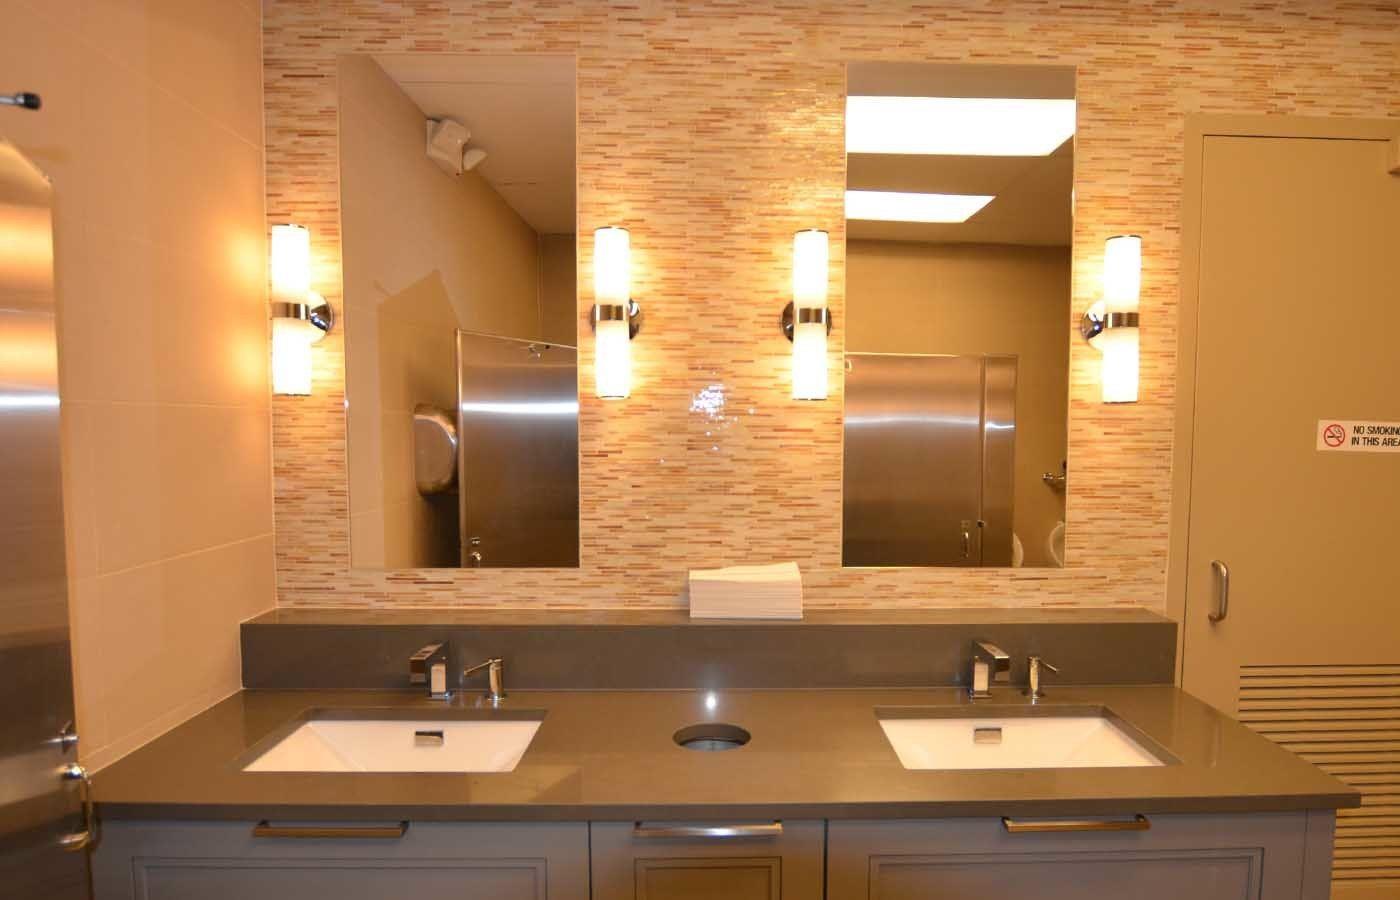 Commercial Restrooms Commercial Construction John